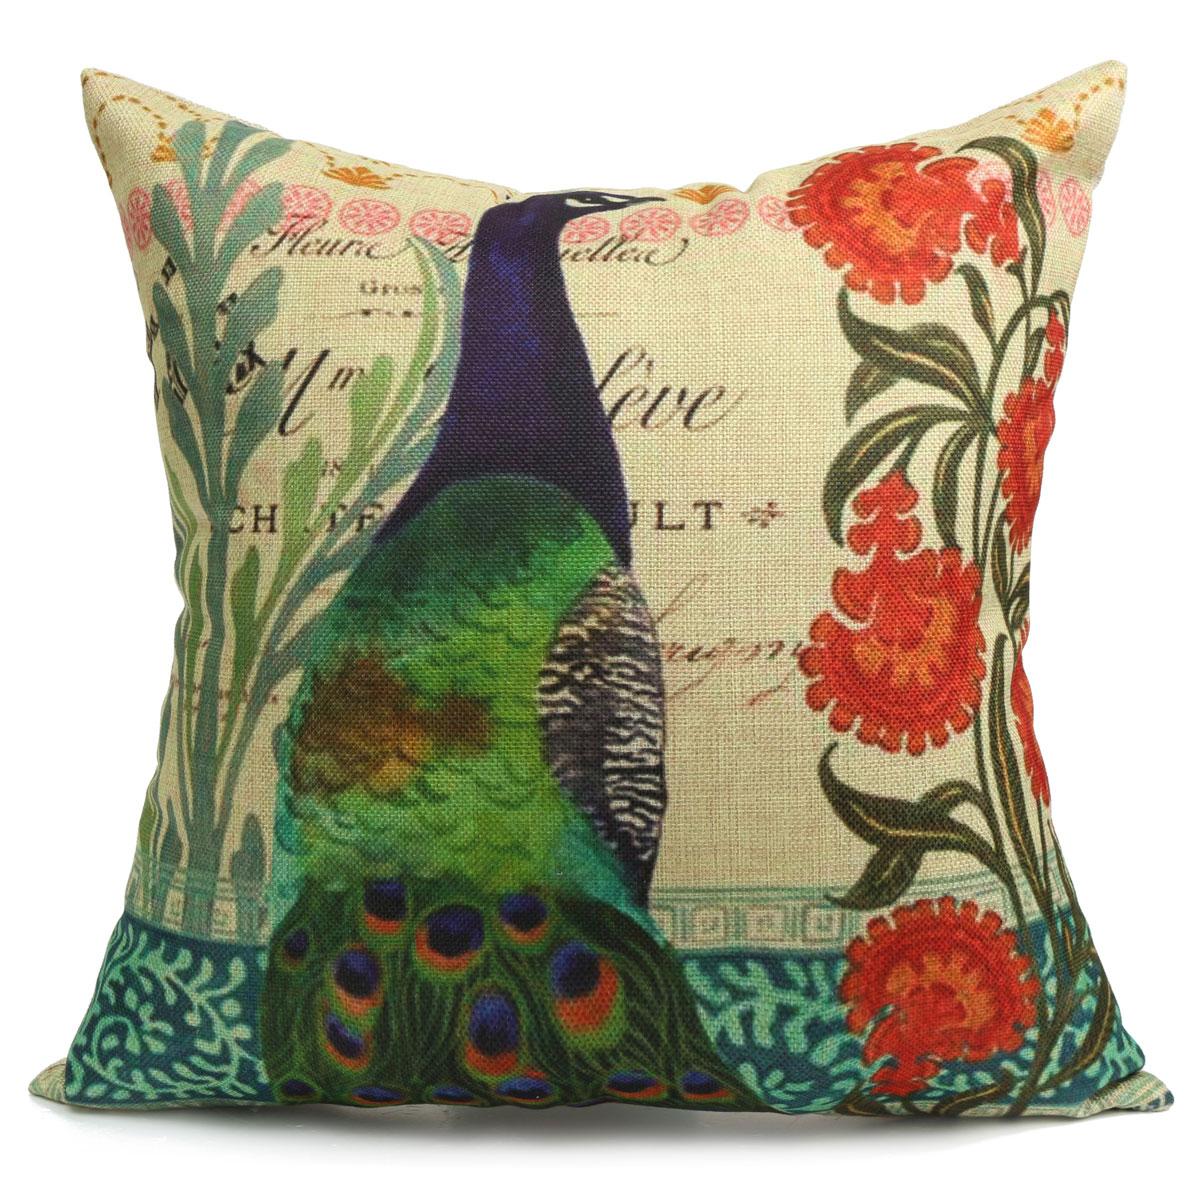 Throw Pillows Peacock : Vintage Flower Peacock Oriental Cushion Cover Decorative Sofa Throw Pillow Case eBay